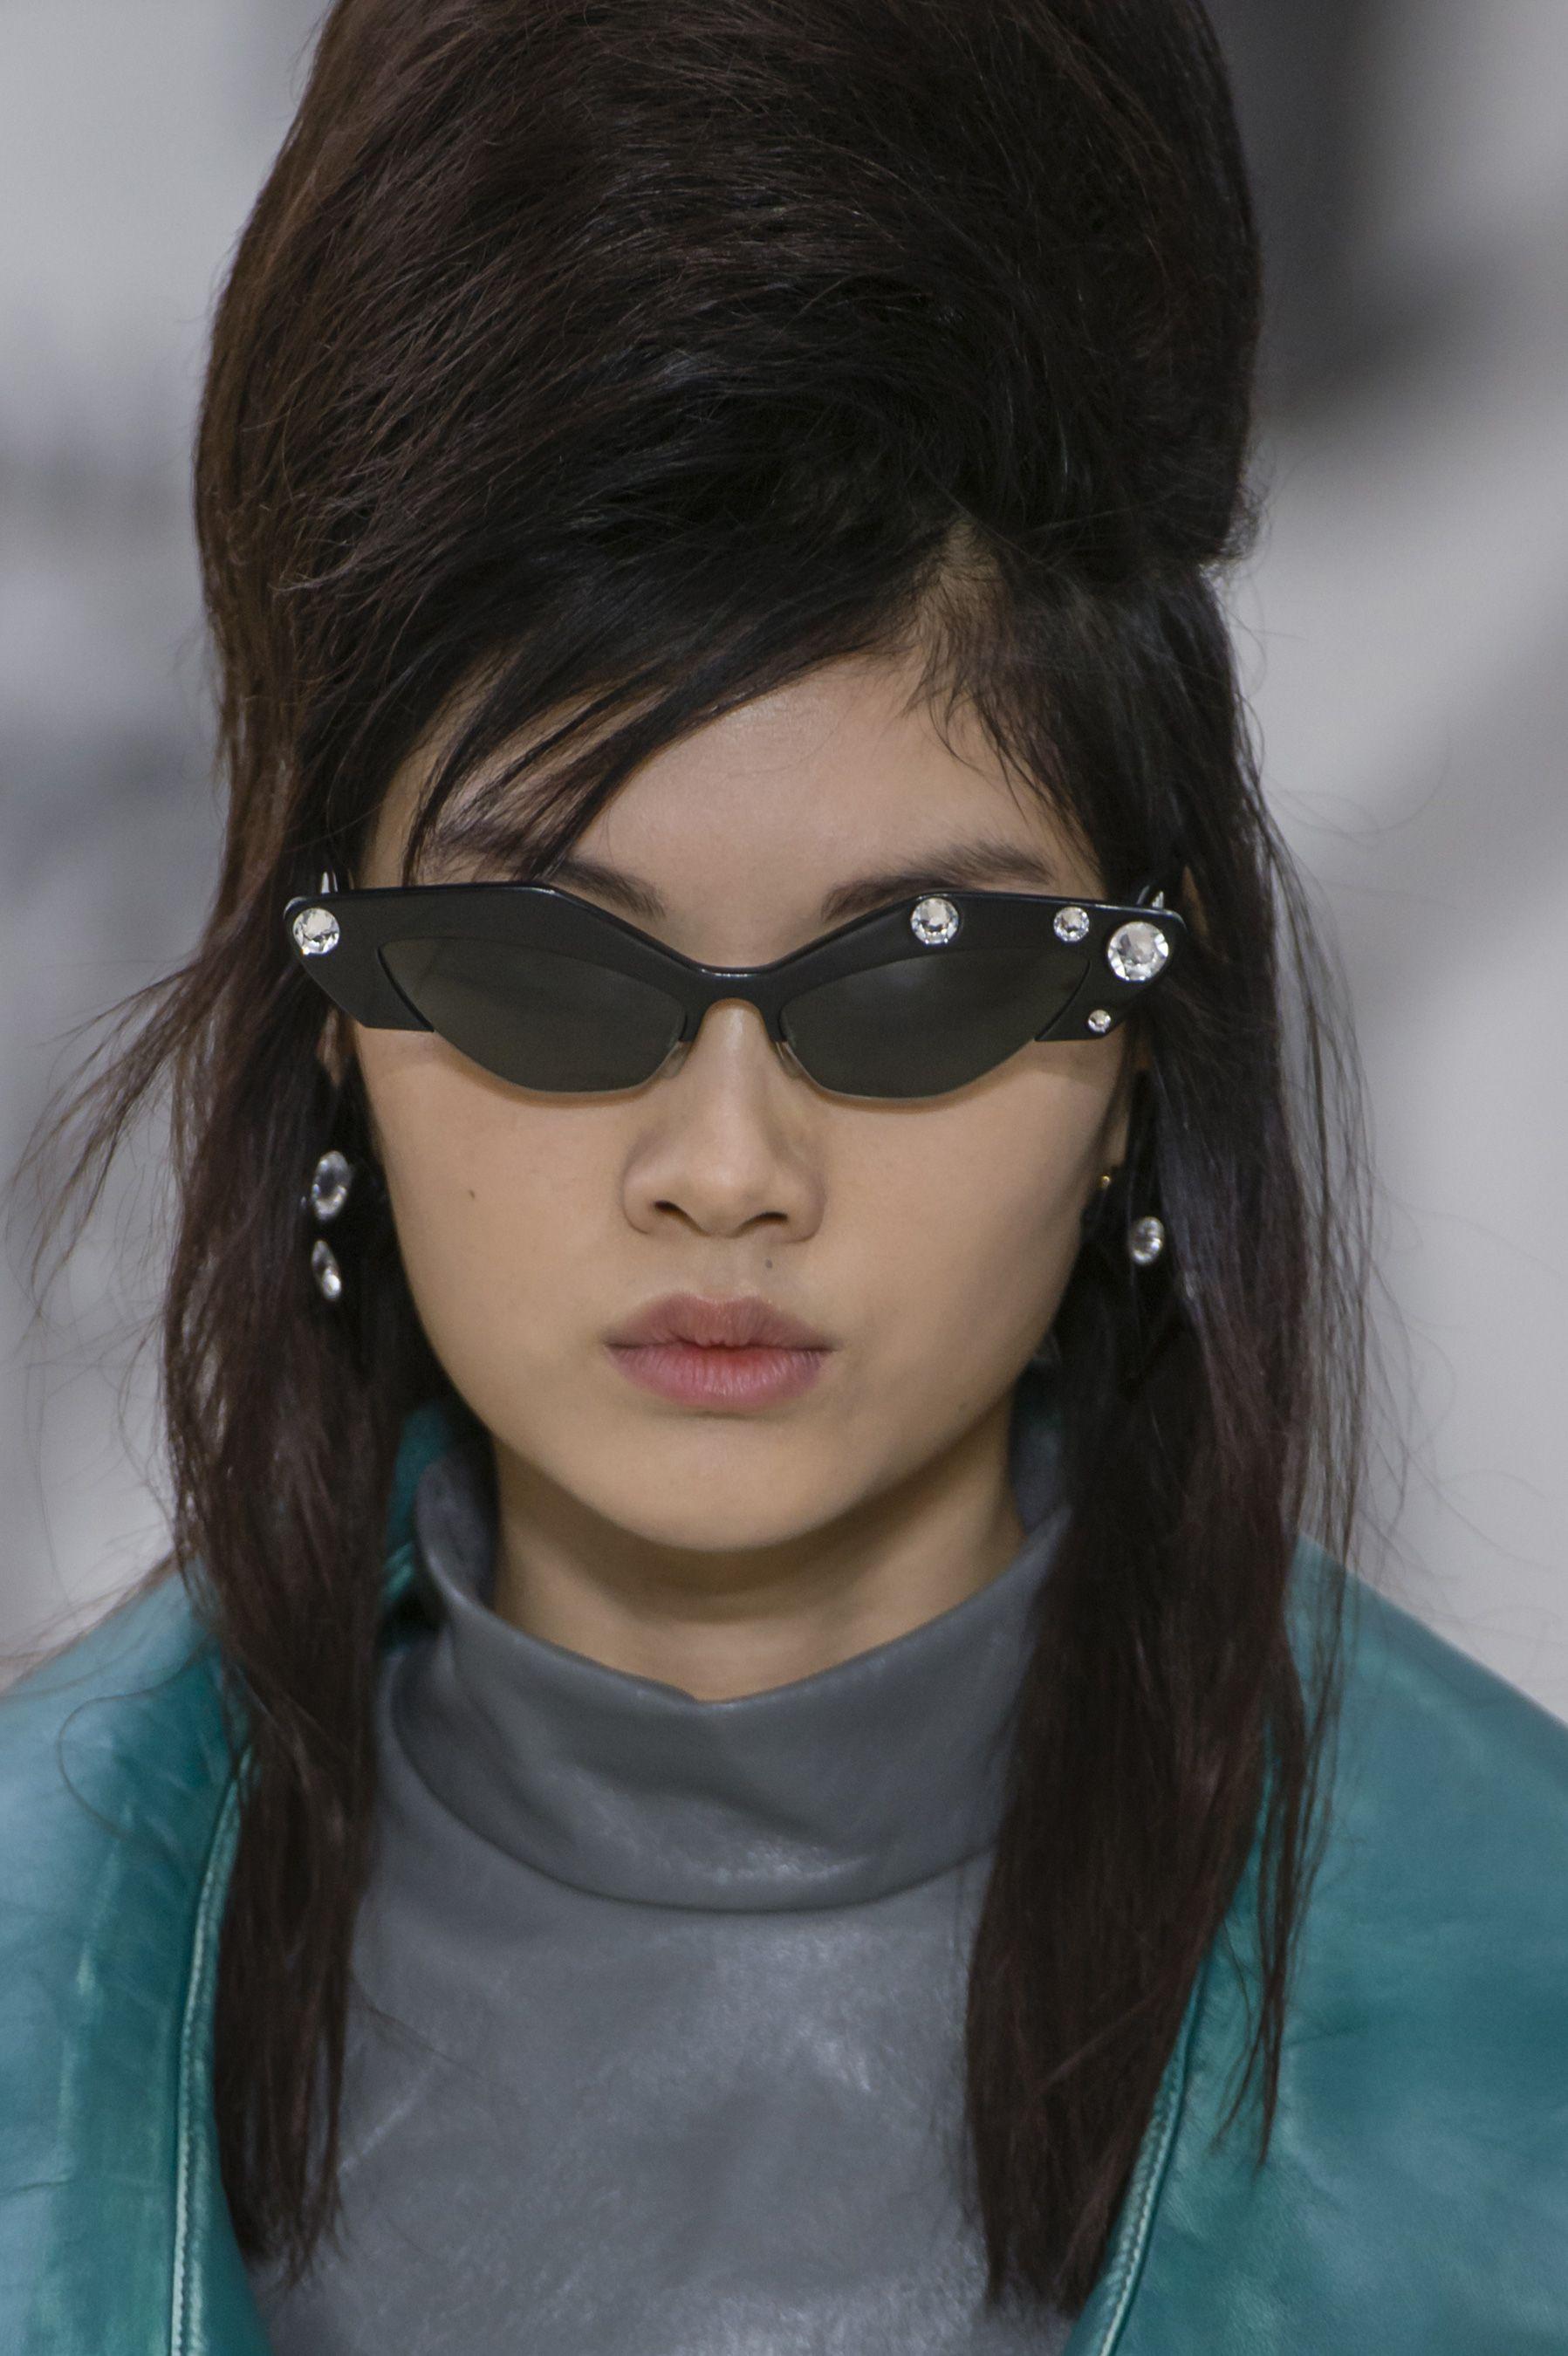 9dac2507620d5 Miu Miu Fall 2018 Fashion Show Details - The Impression | Sun glasses